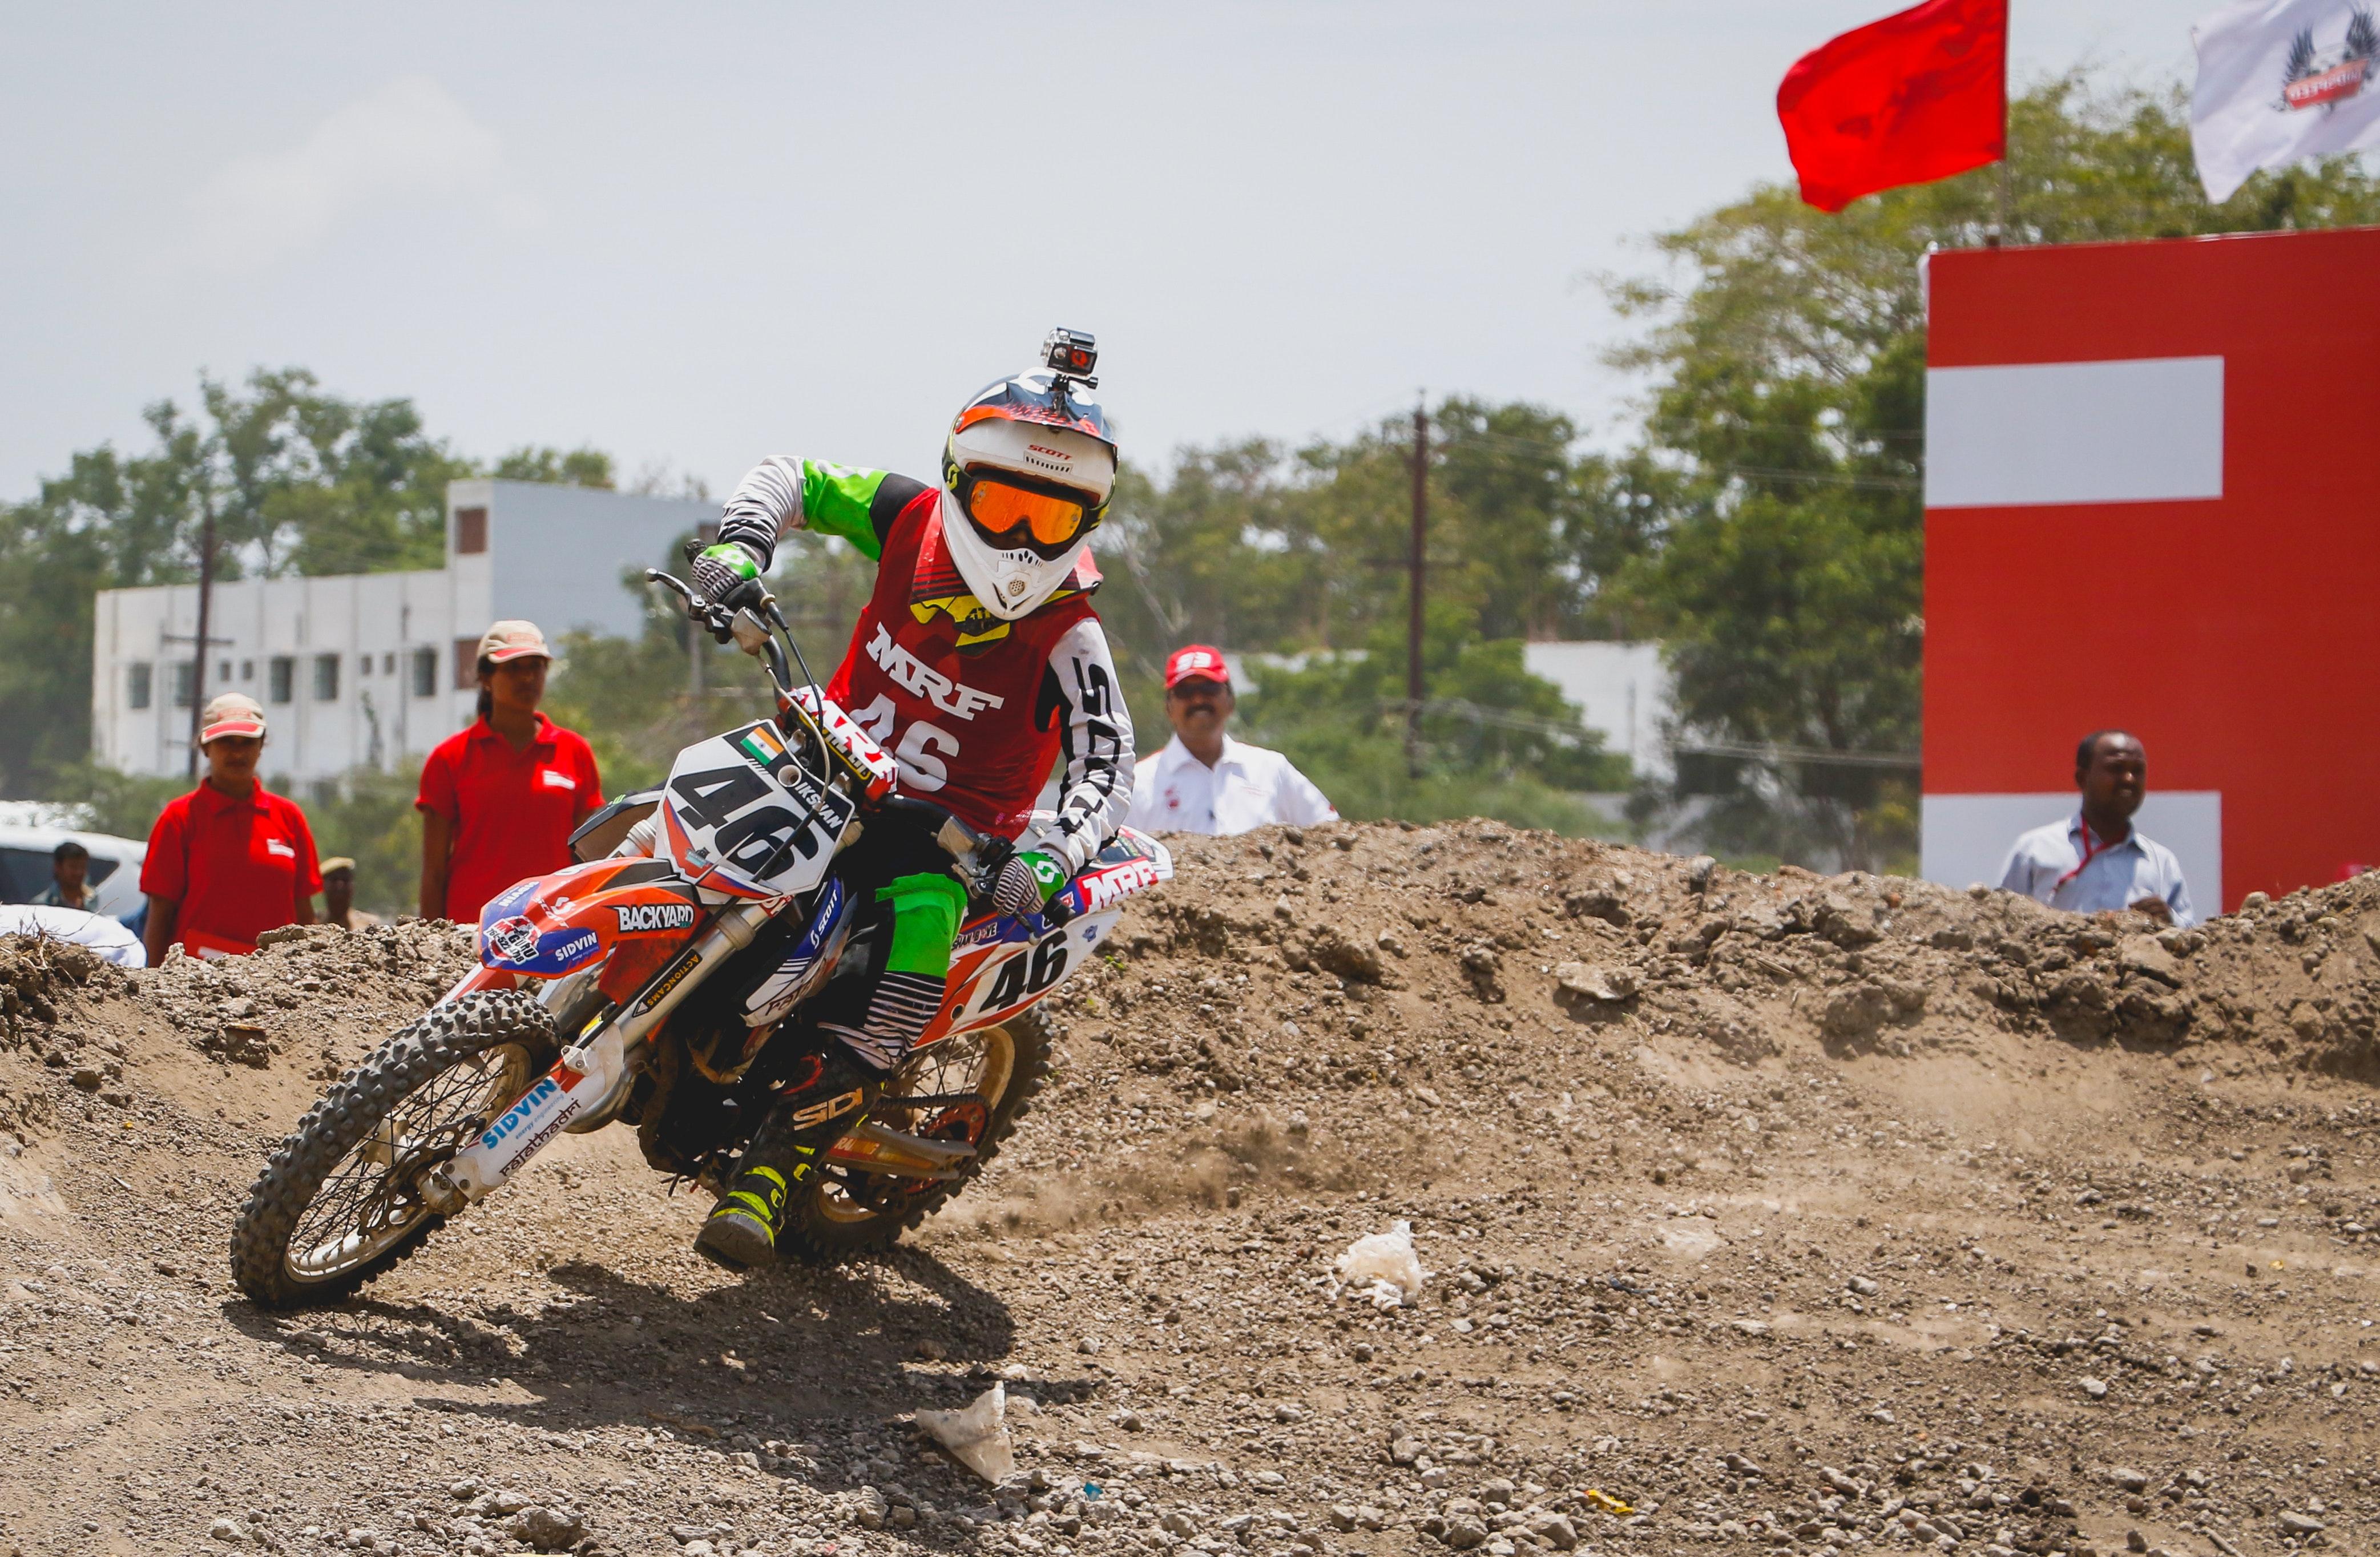 Free stock photo of action, bike racing, dirt